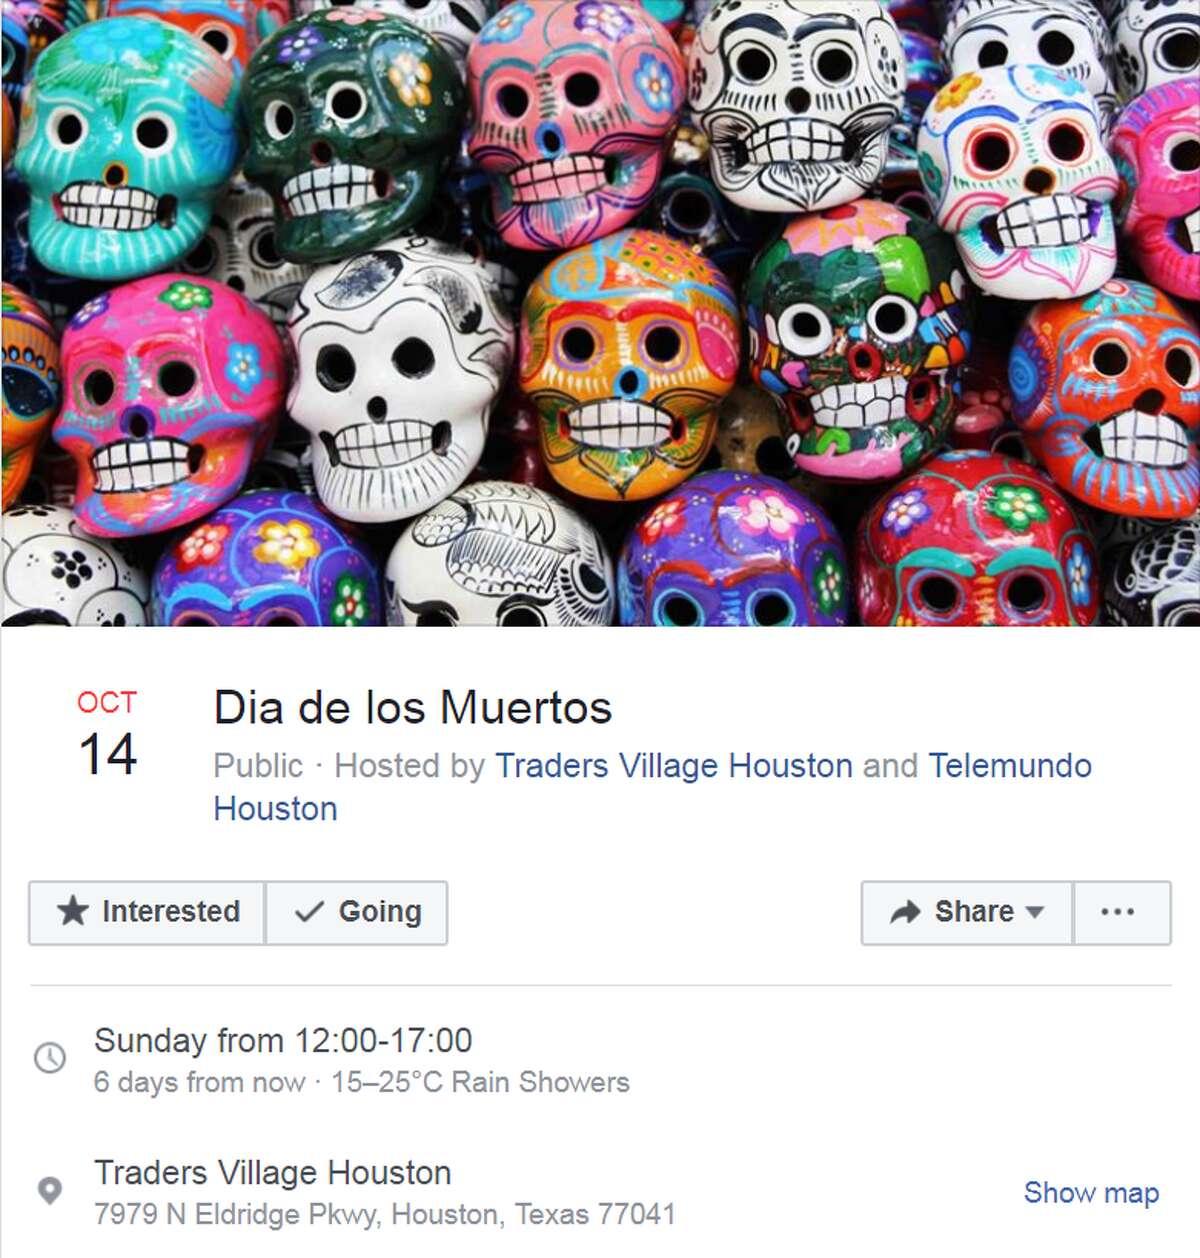 Dia de los Muertos Oct. 14 from 12:00 - 5:00 p.m. Traders Village Houston Hosted by Traders Village Houston and Telemundo Houston More info